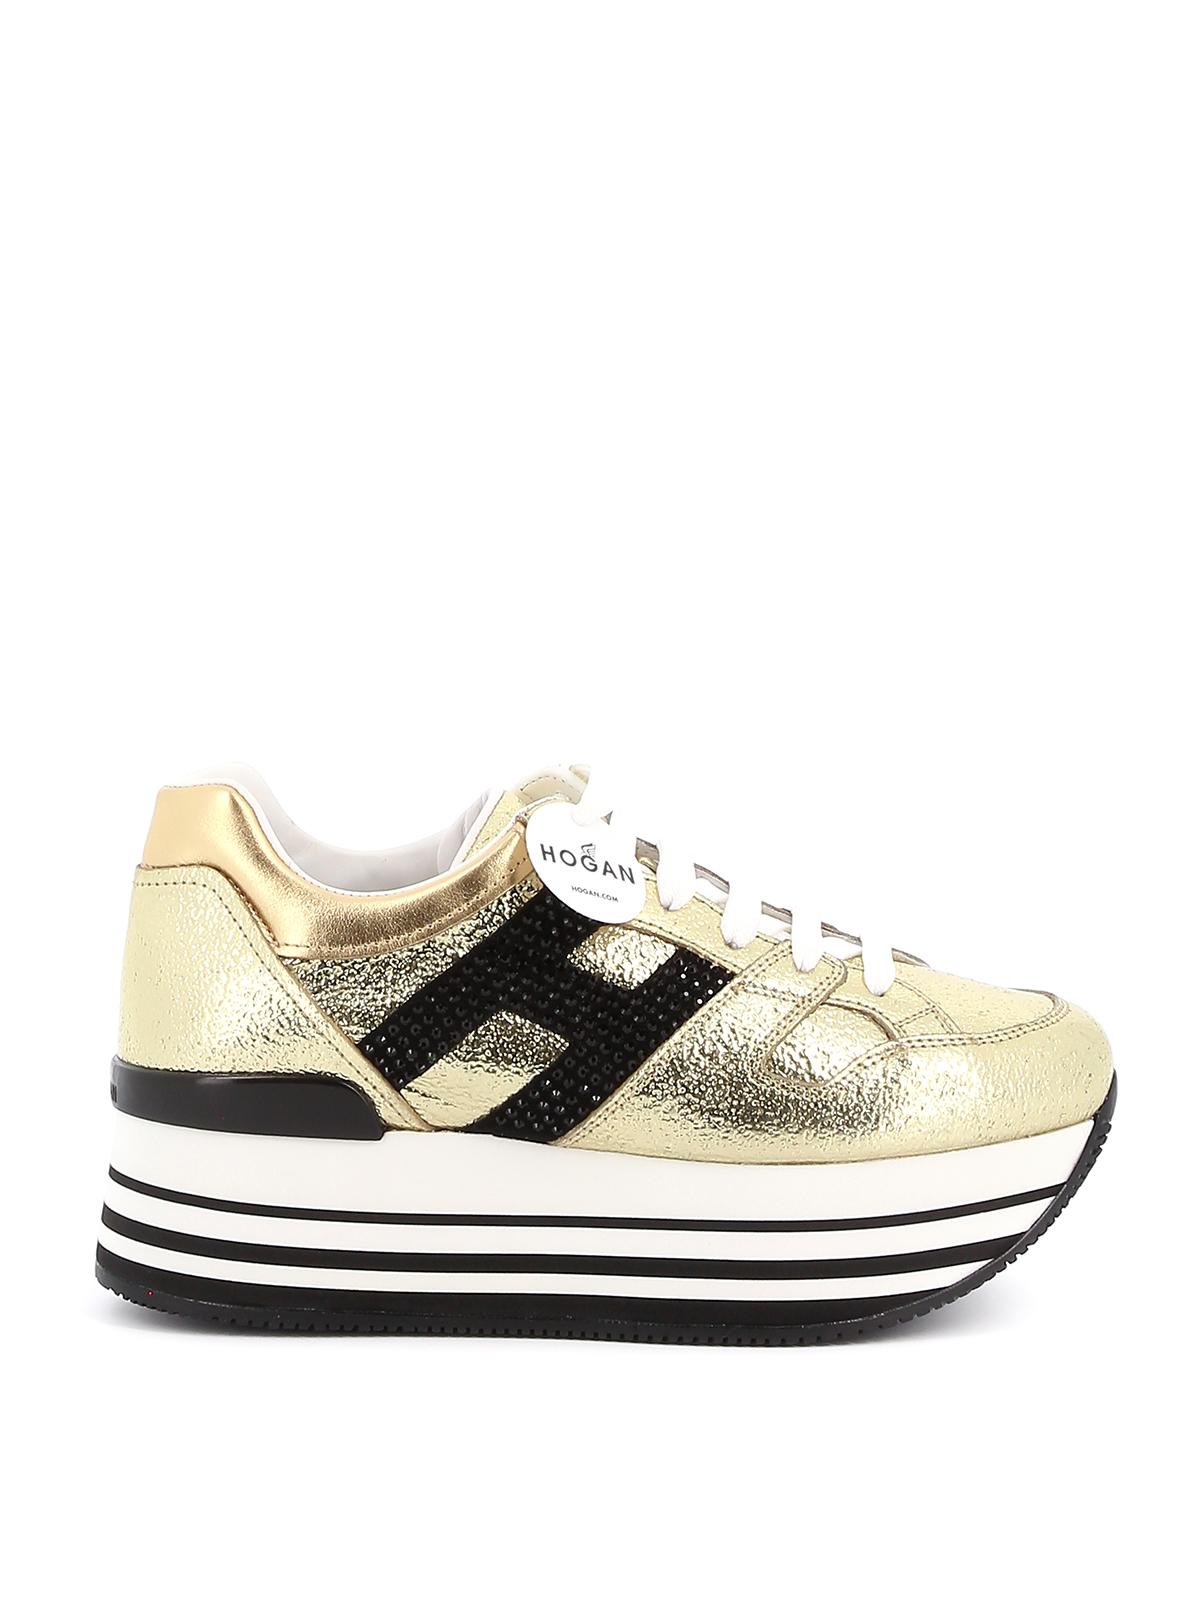 Trainers Hogan - Maxi H222 sneakers - HXW2830Y411NF71805 | iKRIX.com